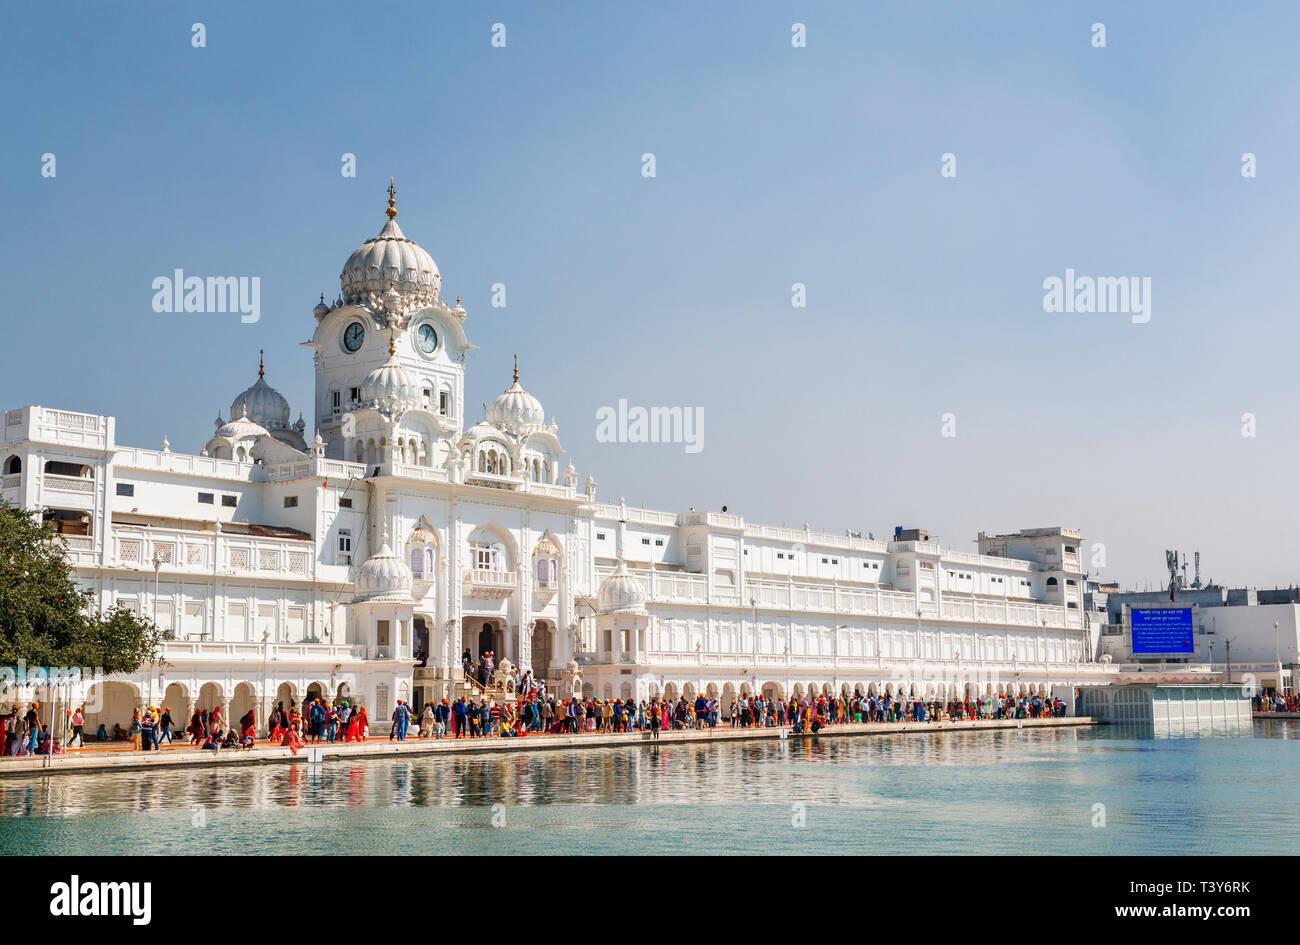 Golden Temple of Amritsar (Sri Harmandir Sahib, Darbar Sahib) and pool, the holiest Gurdwara and pilgrimage site of Sikhism, Amritsar, Punjab, India - Stock Image